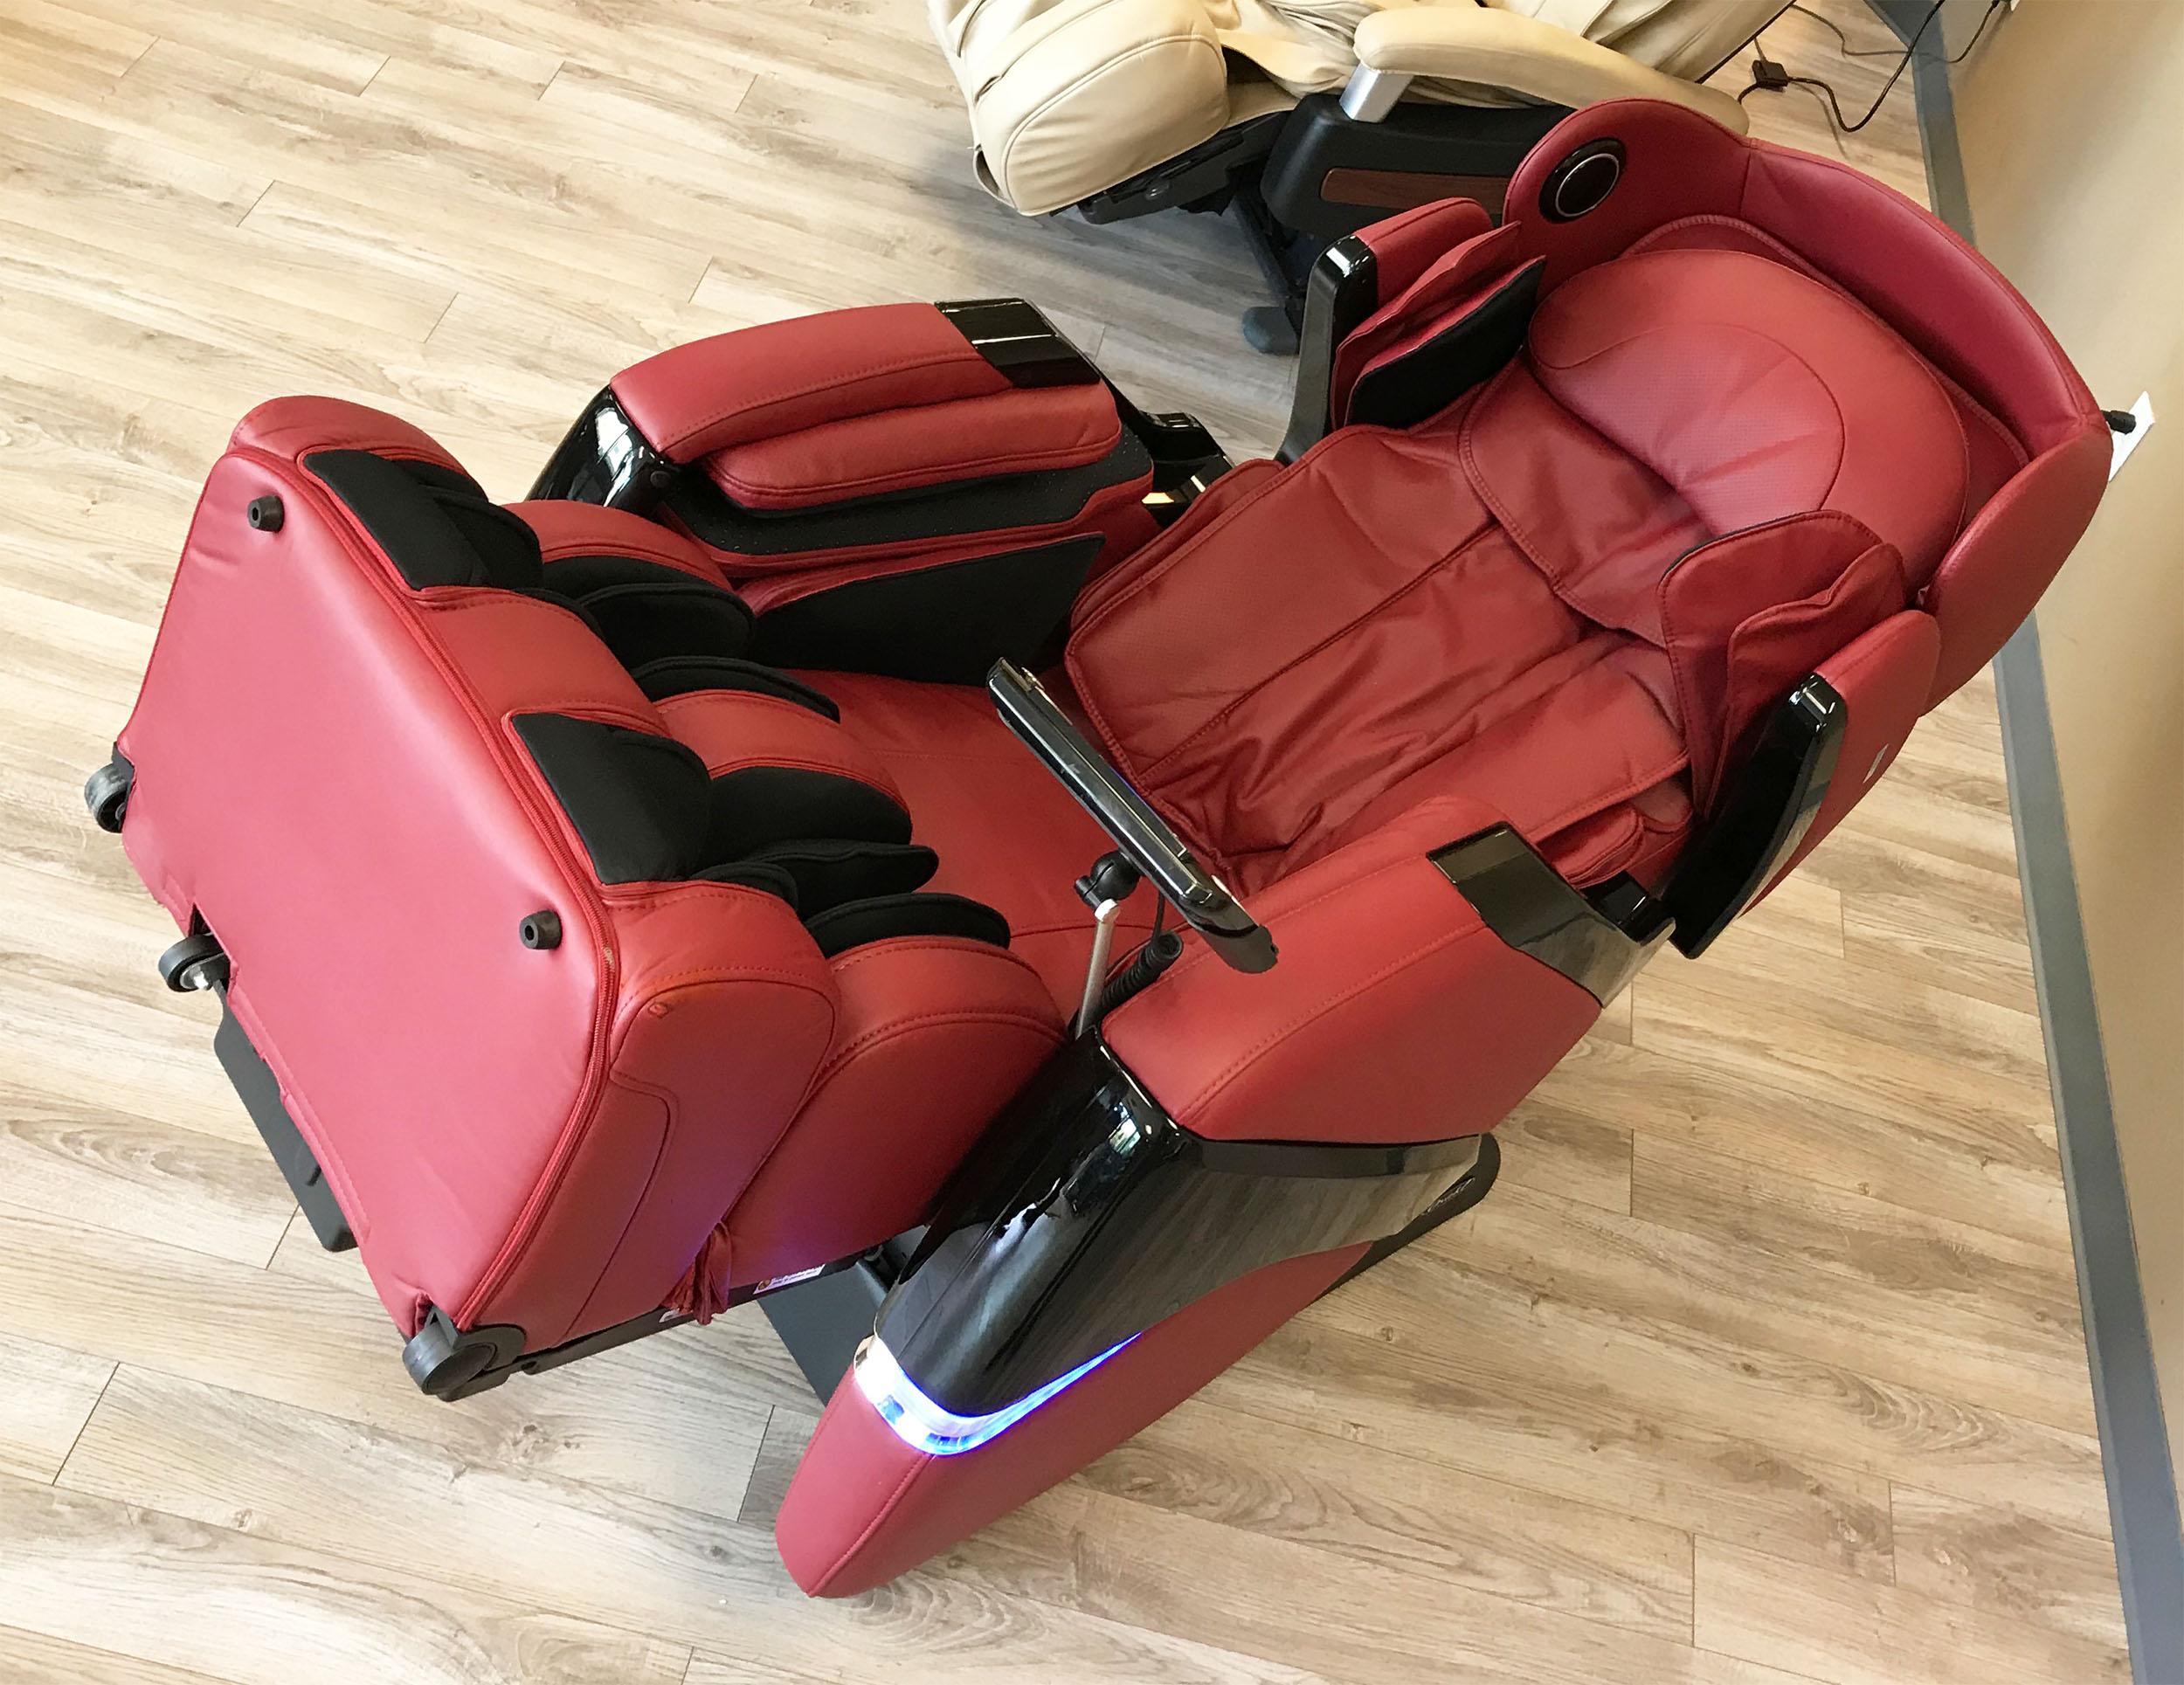 osaki os 3d pro cyber massage chair arm and ottoman zero gravity recliner